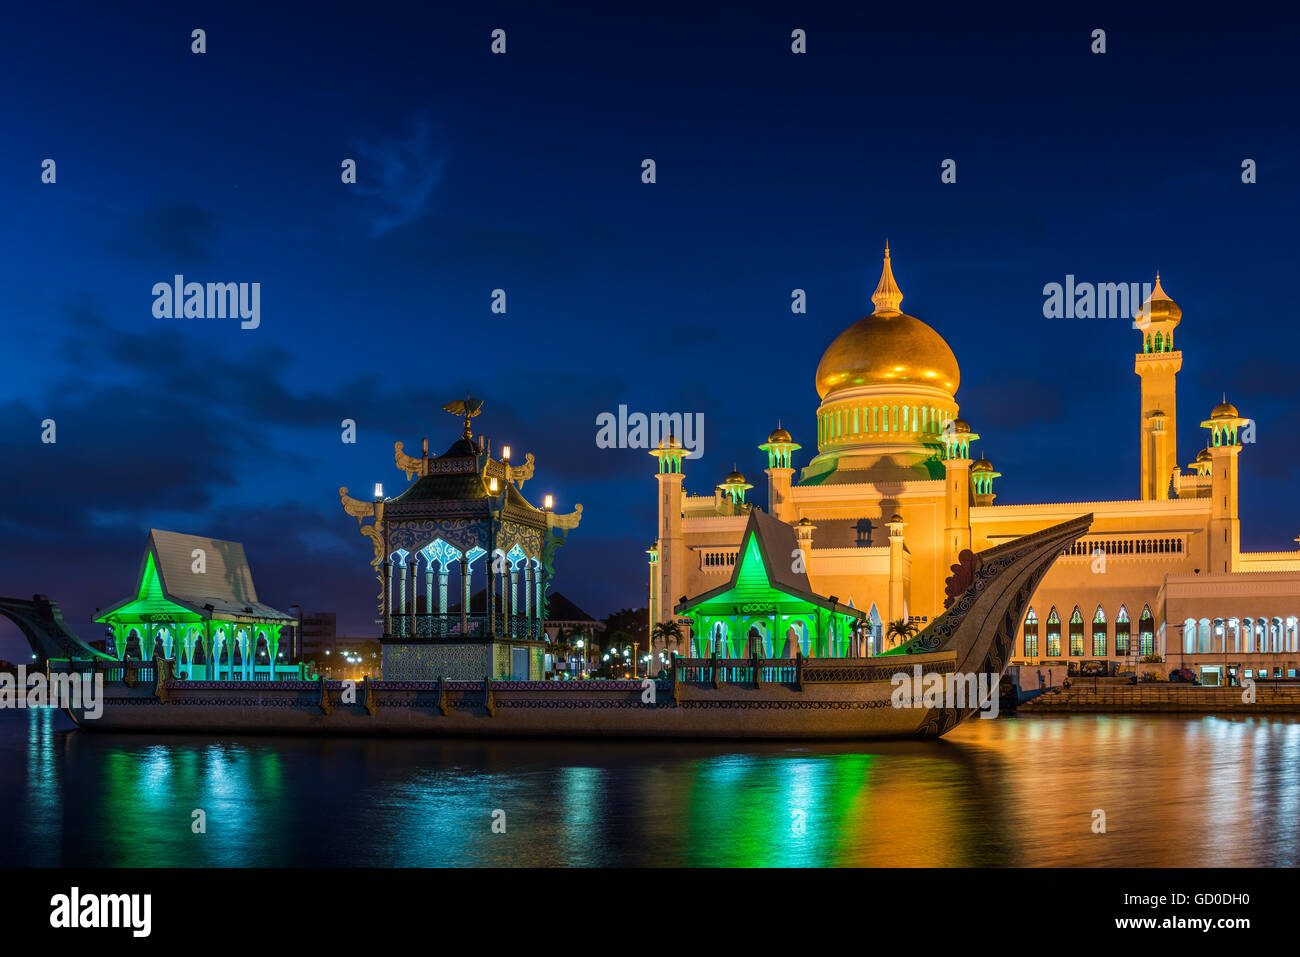 The Sultan Omar Ali Saifuddin Mosque in Bandar Seri Begawan, Brunei, lit up at night. - Stock Image